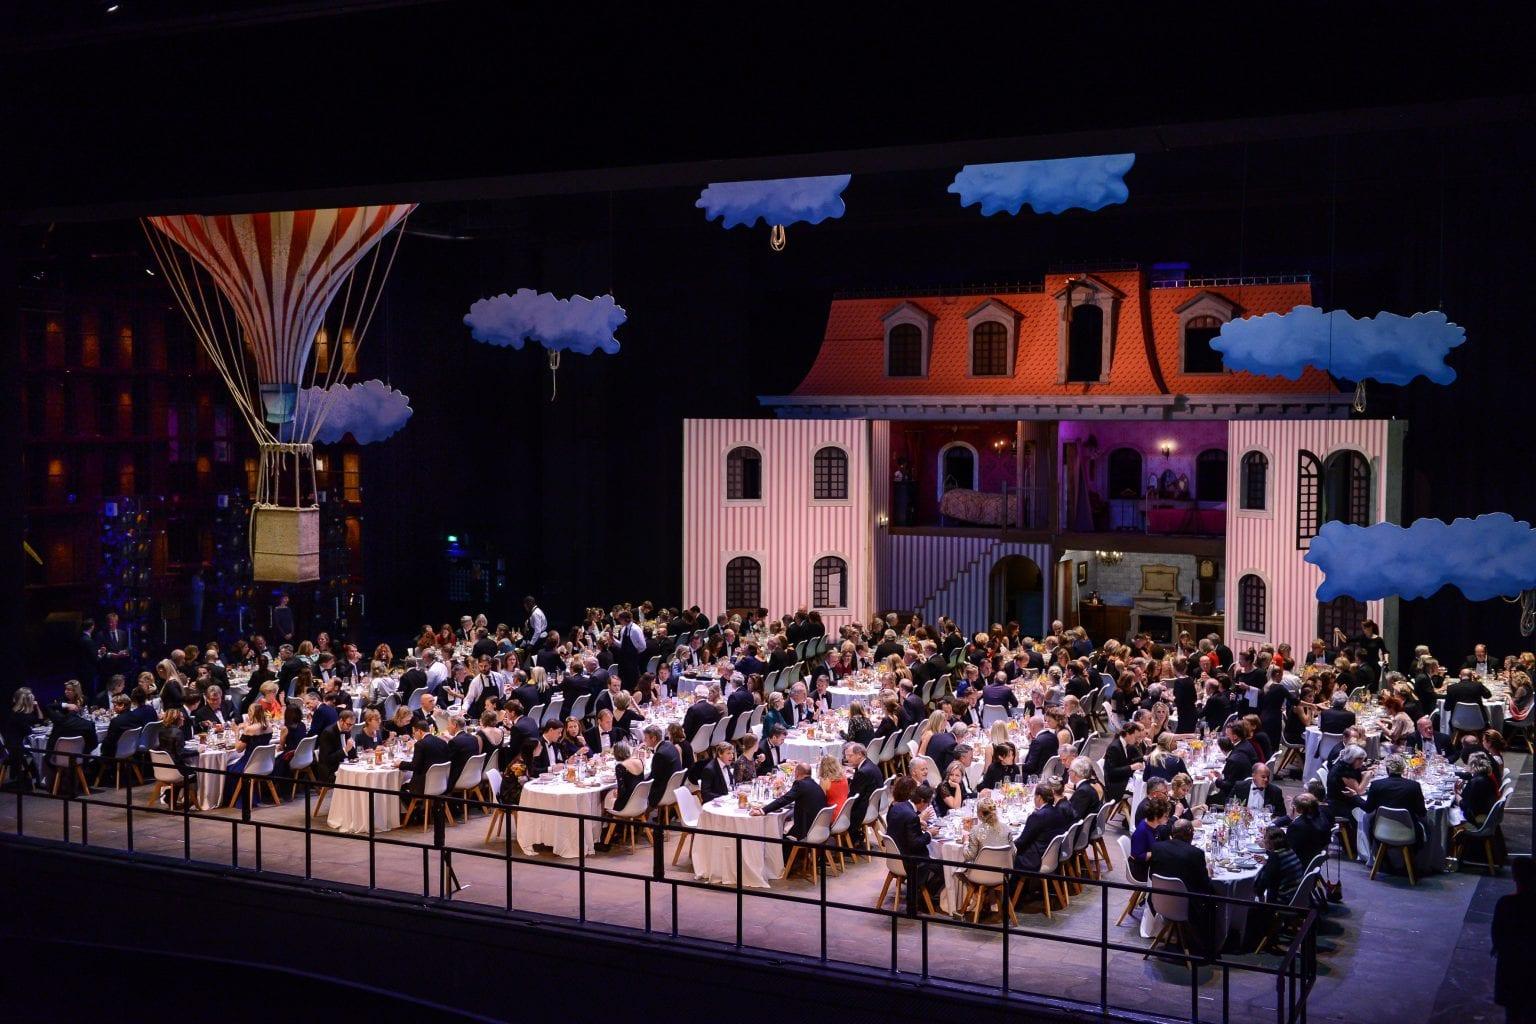 Dinner on stage